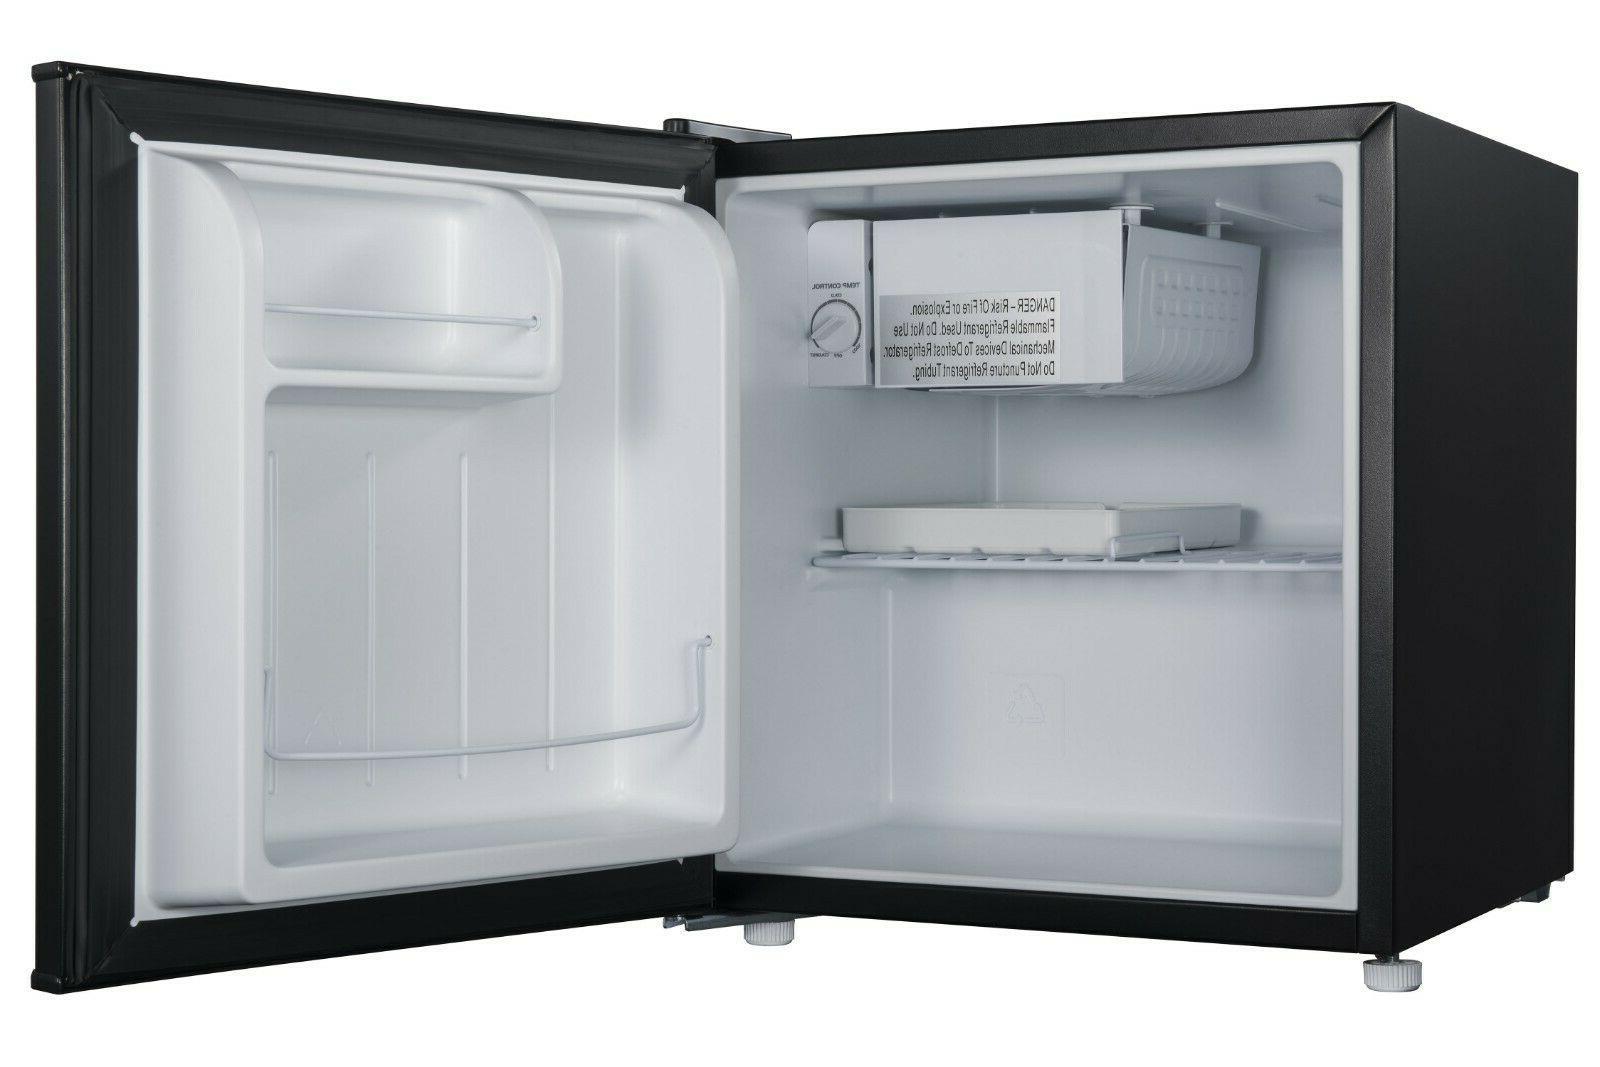 Mini Fridge 1.7 cubic feet compact dorm energy